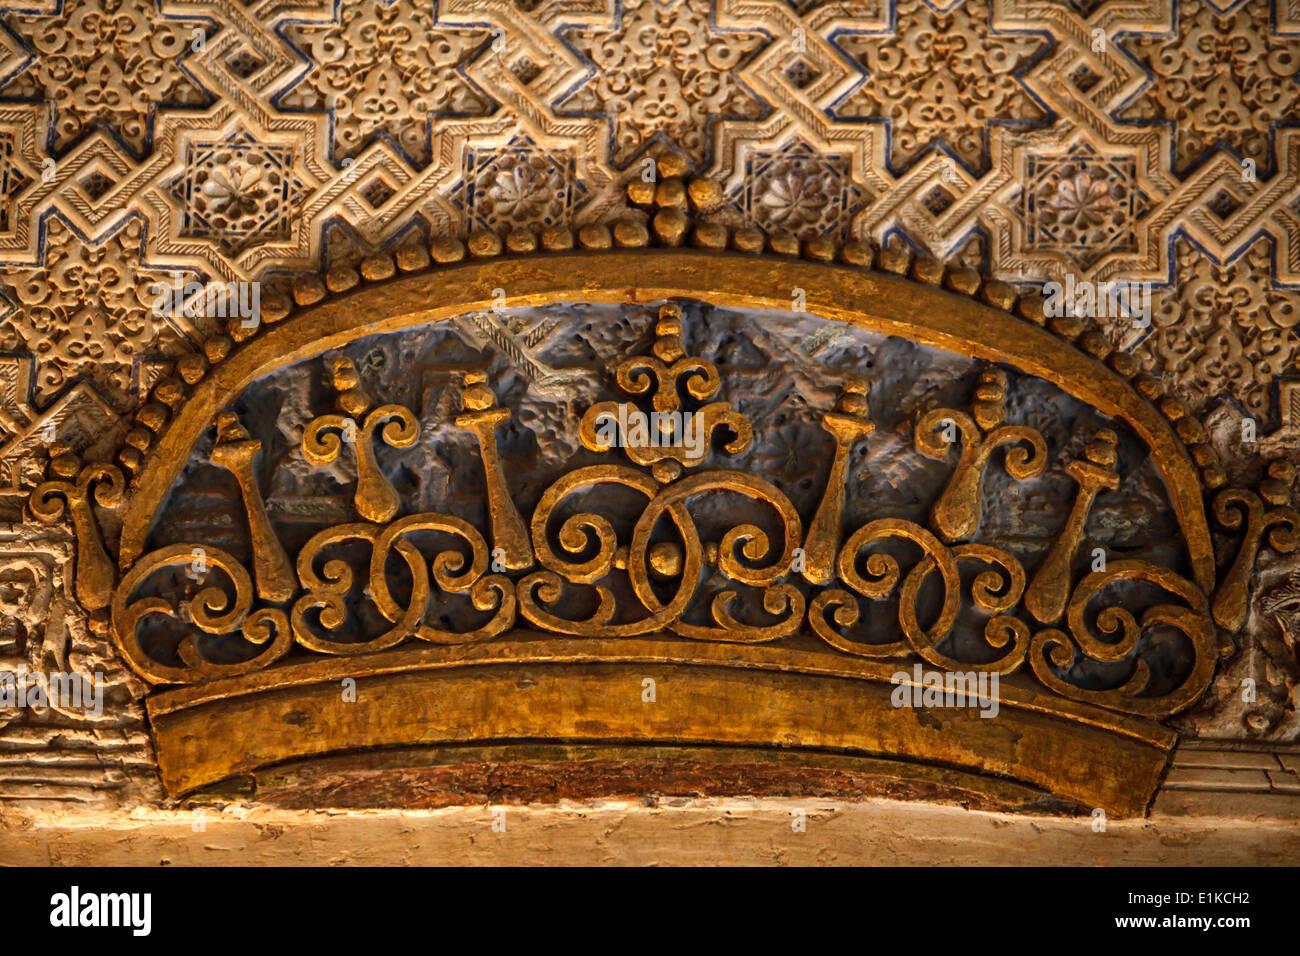 Alhambra - Nasrid Palaces  - Mexuar Palace - Charles V's crown - Stock Image